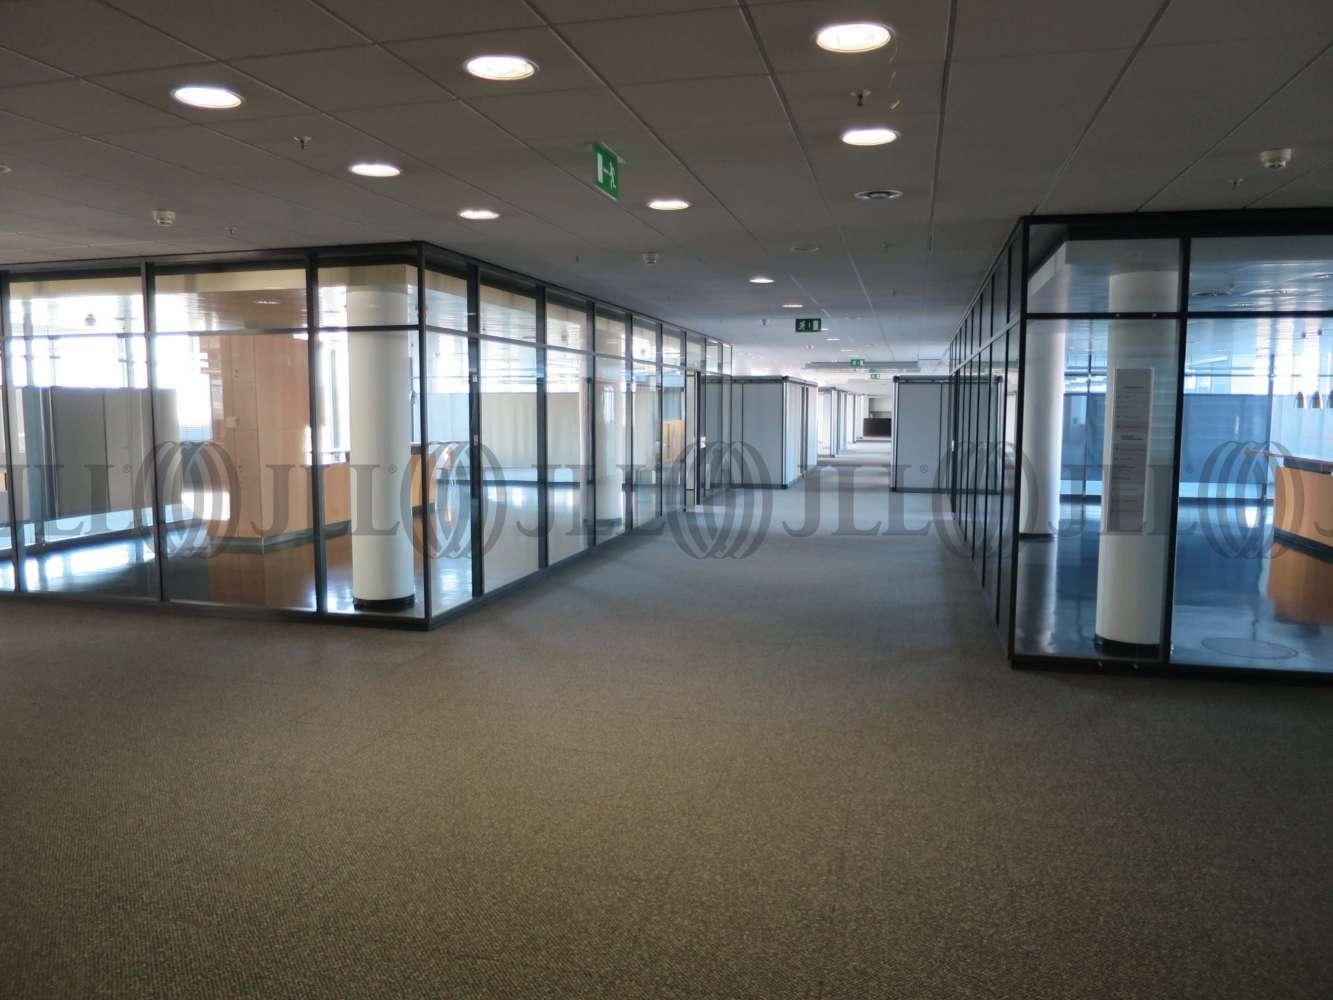 Büros Frankfurt am main, 60386 - Büro - Frankfurt am Main, Fechenheim - F2401 - 9534739